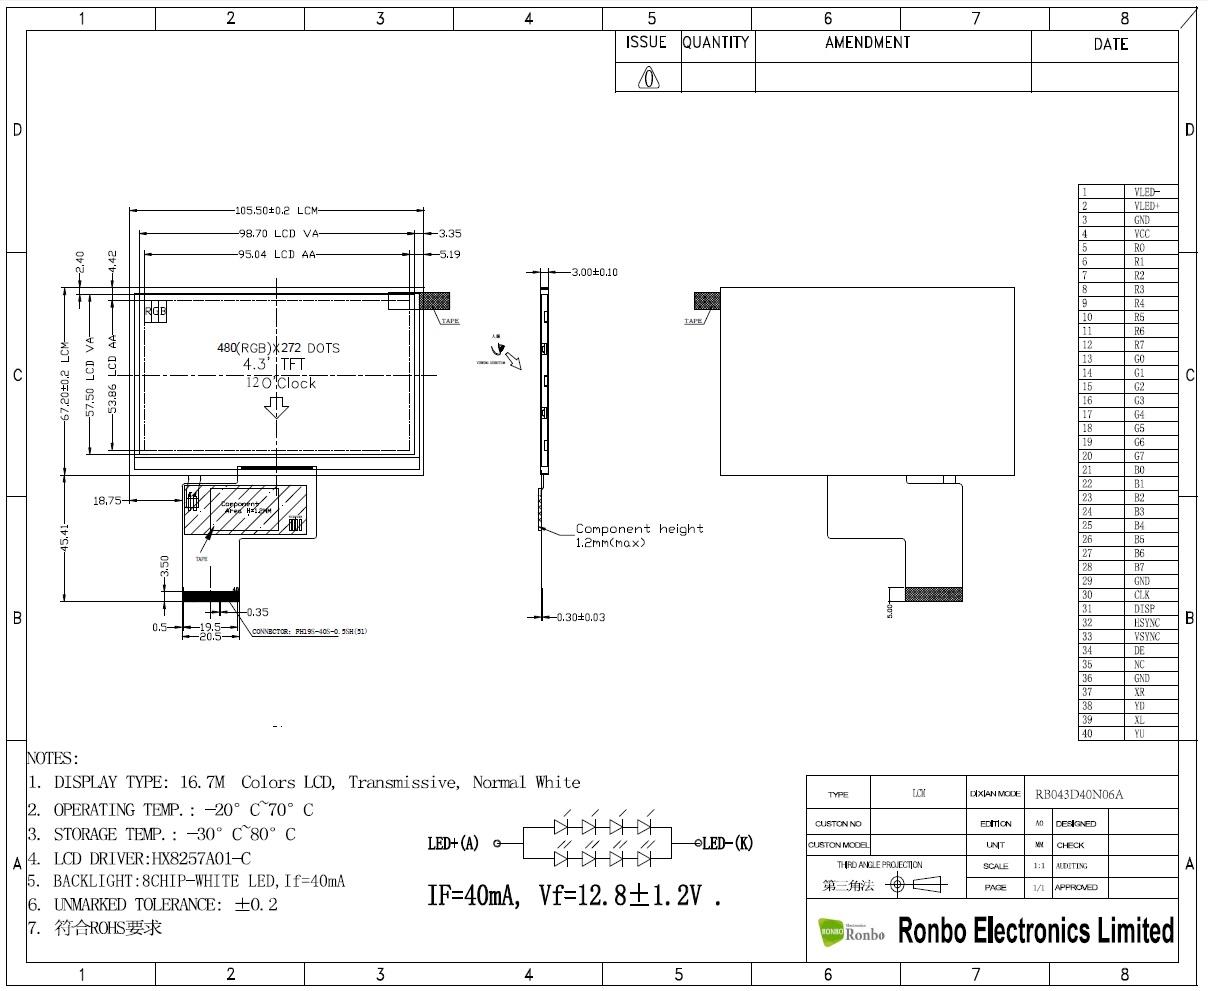 RB043D40N06A_03.jpg